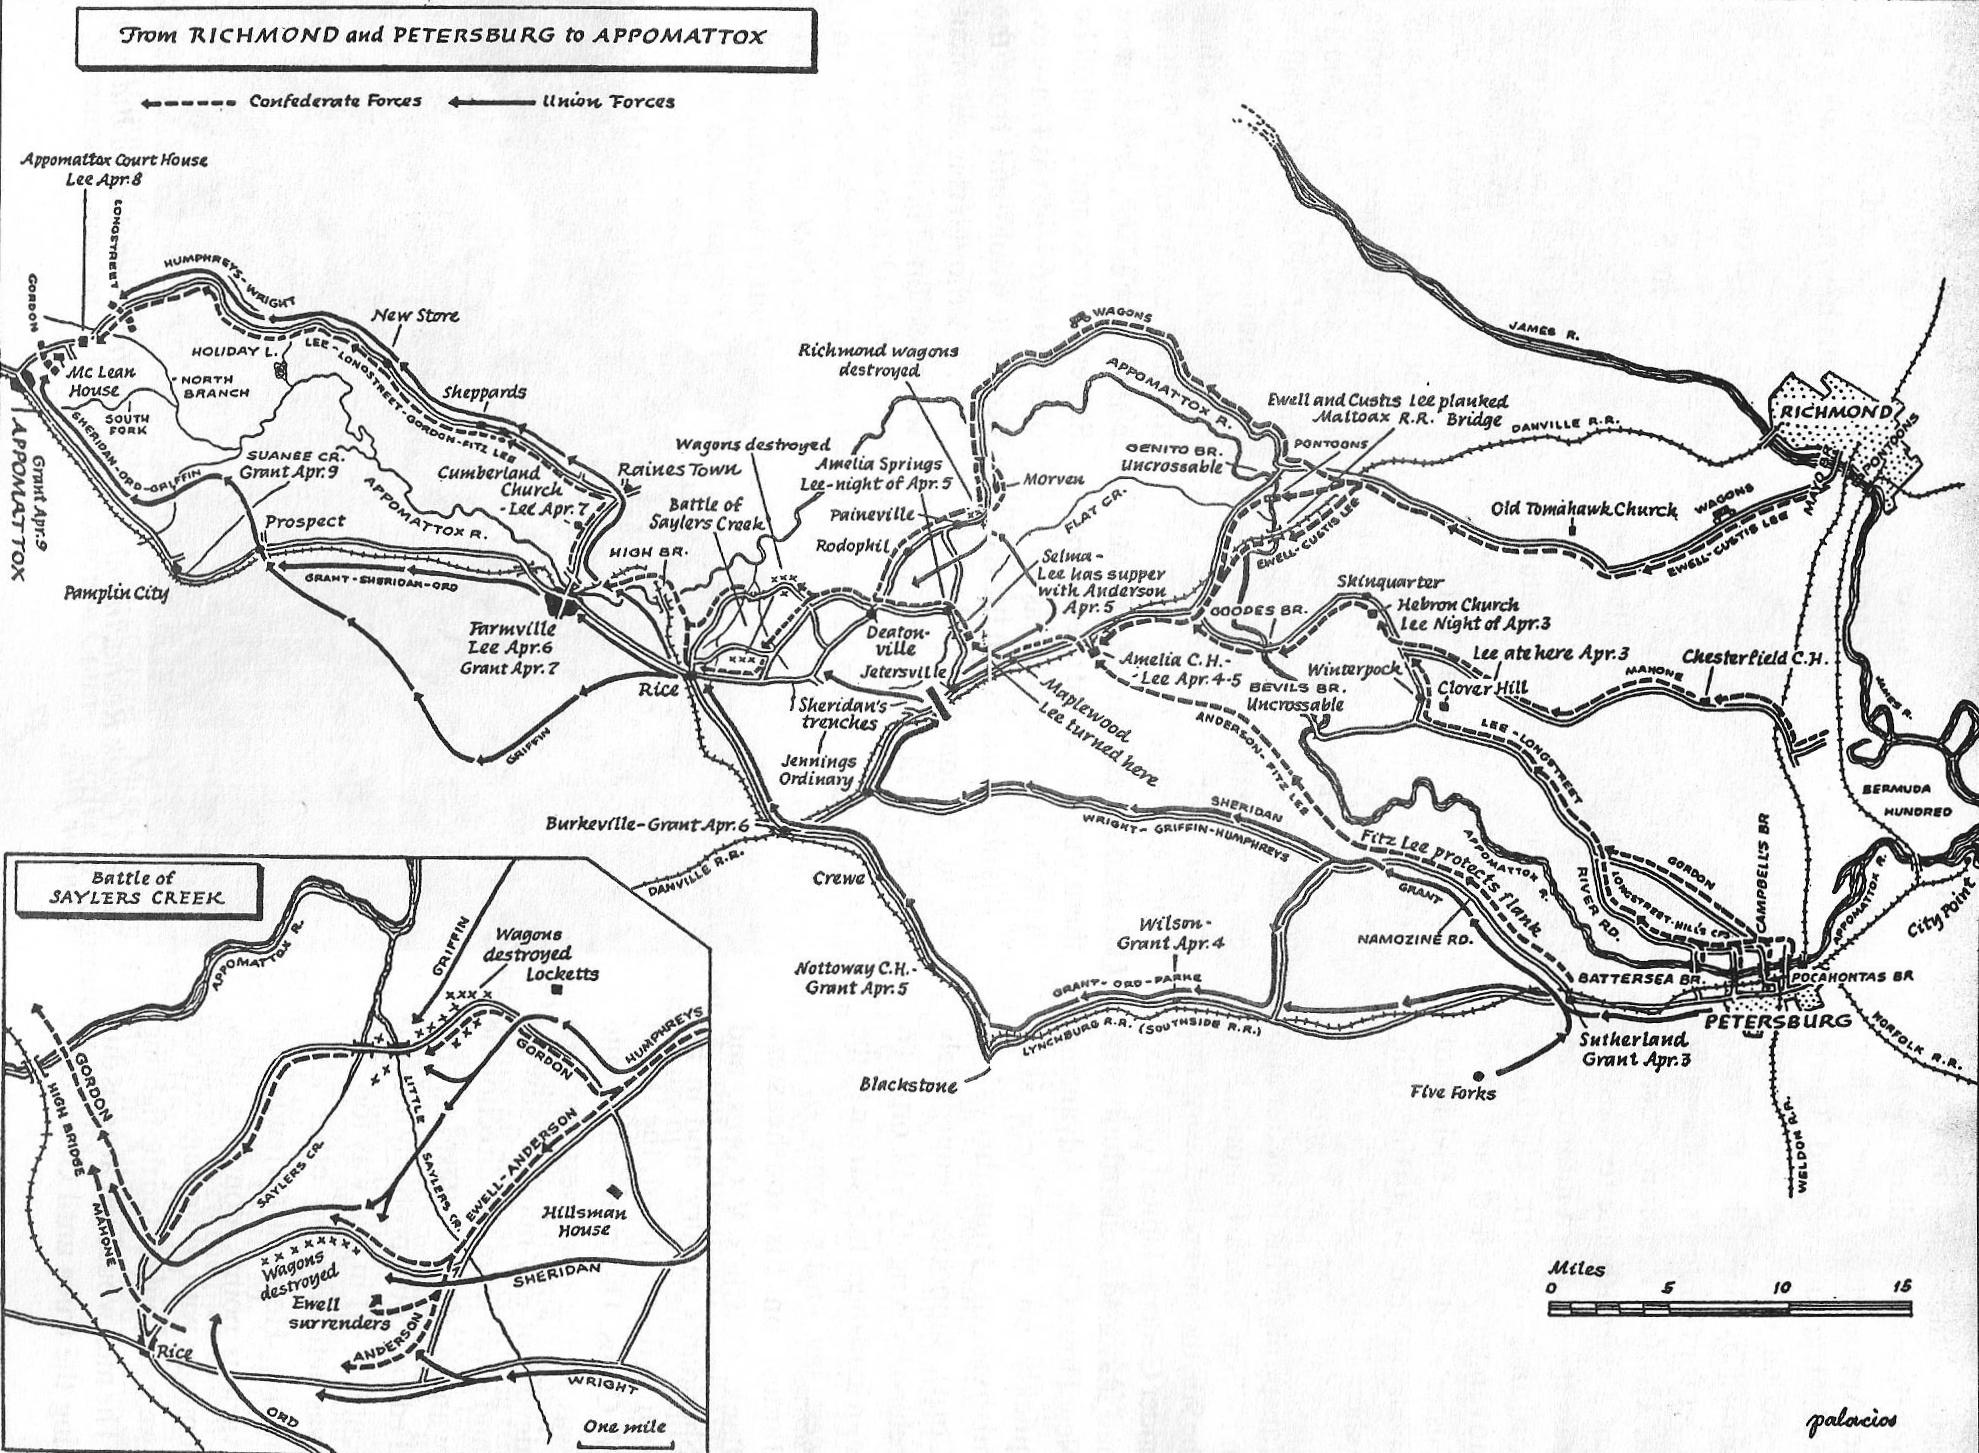 Map Petg to Appomattox